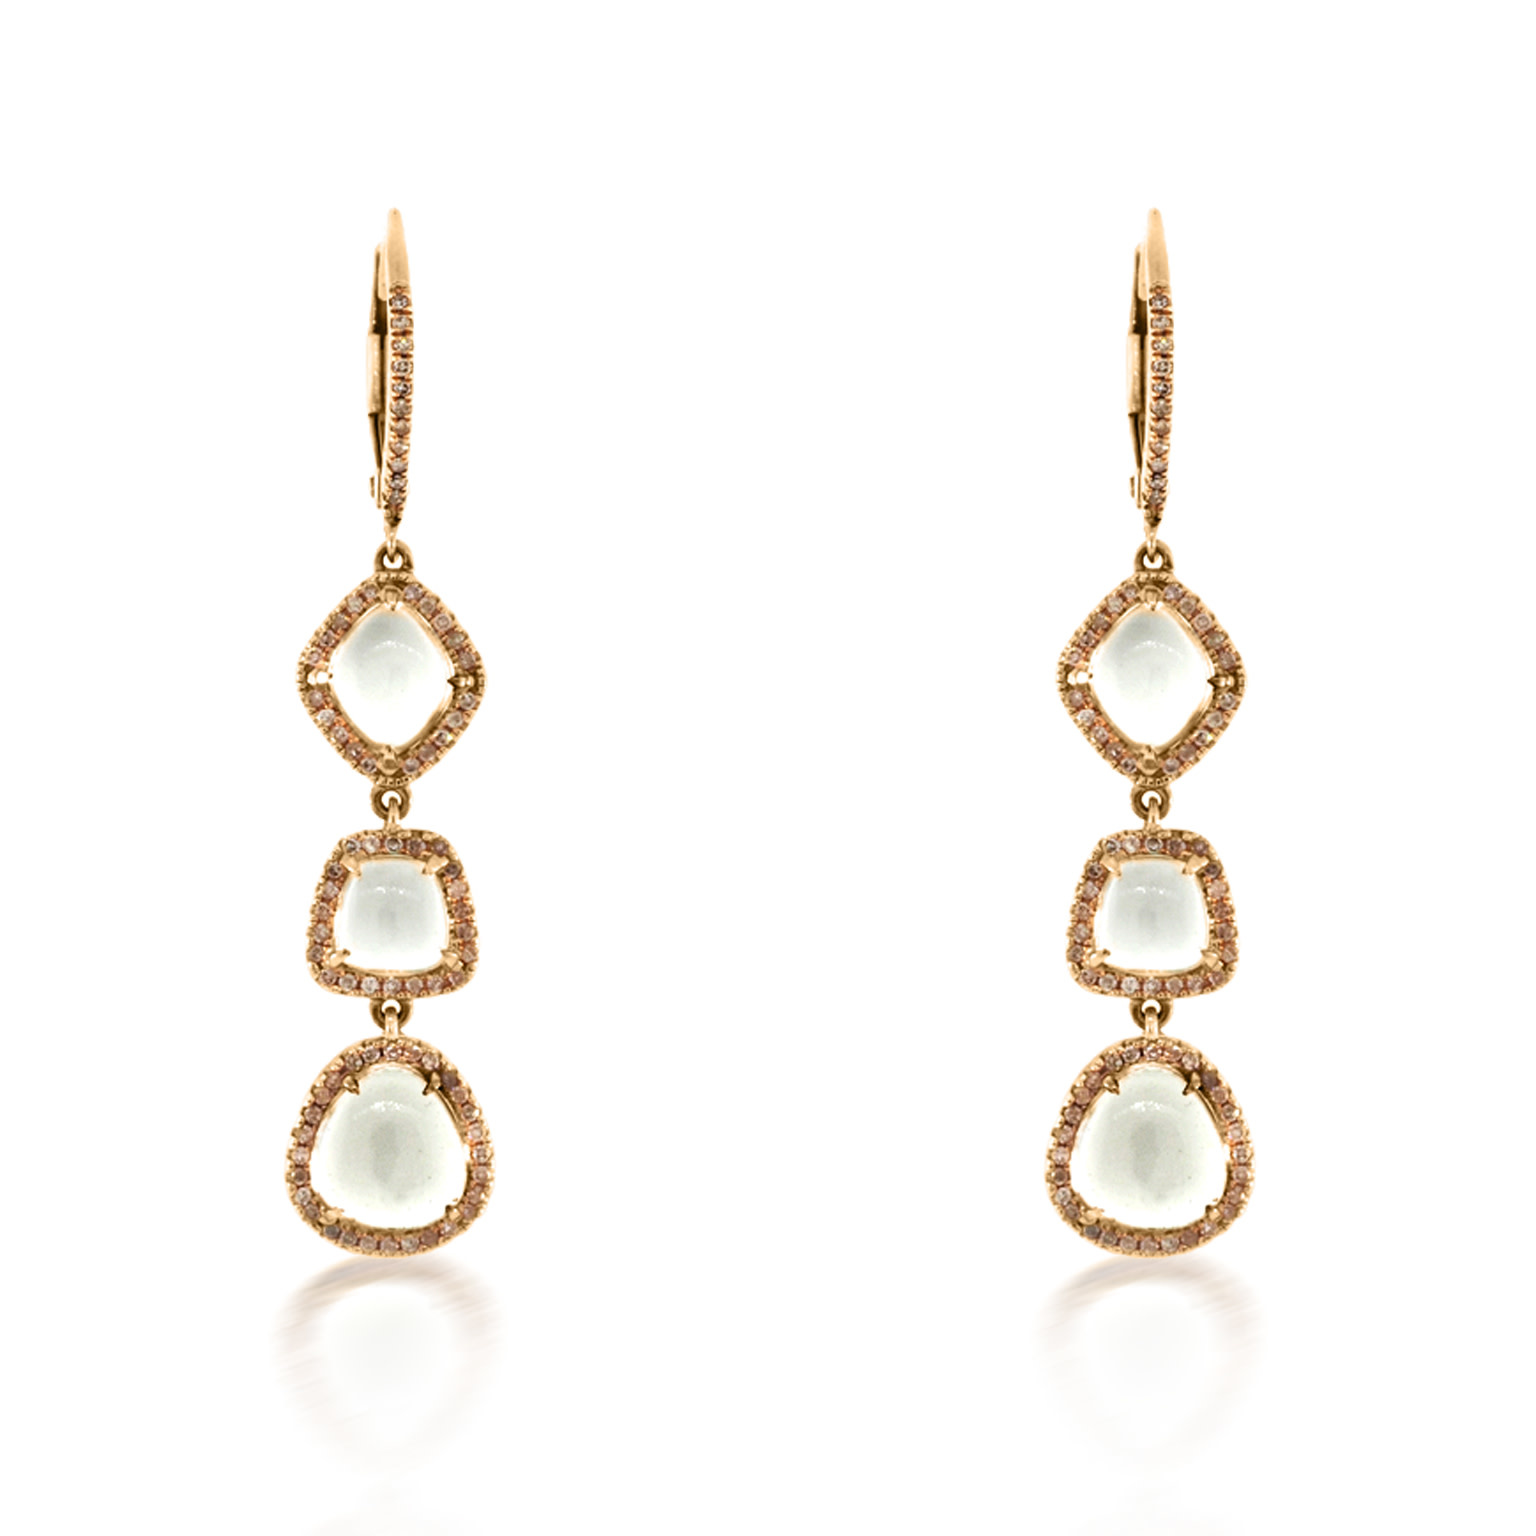 Trabert Goldsmiths White Topaz and Diamond Drop Earrings